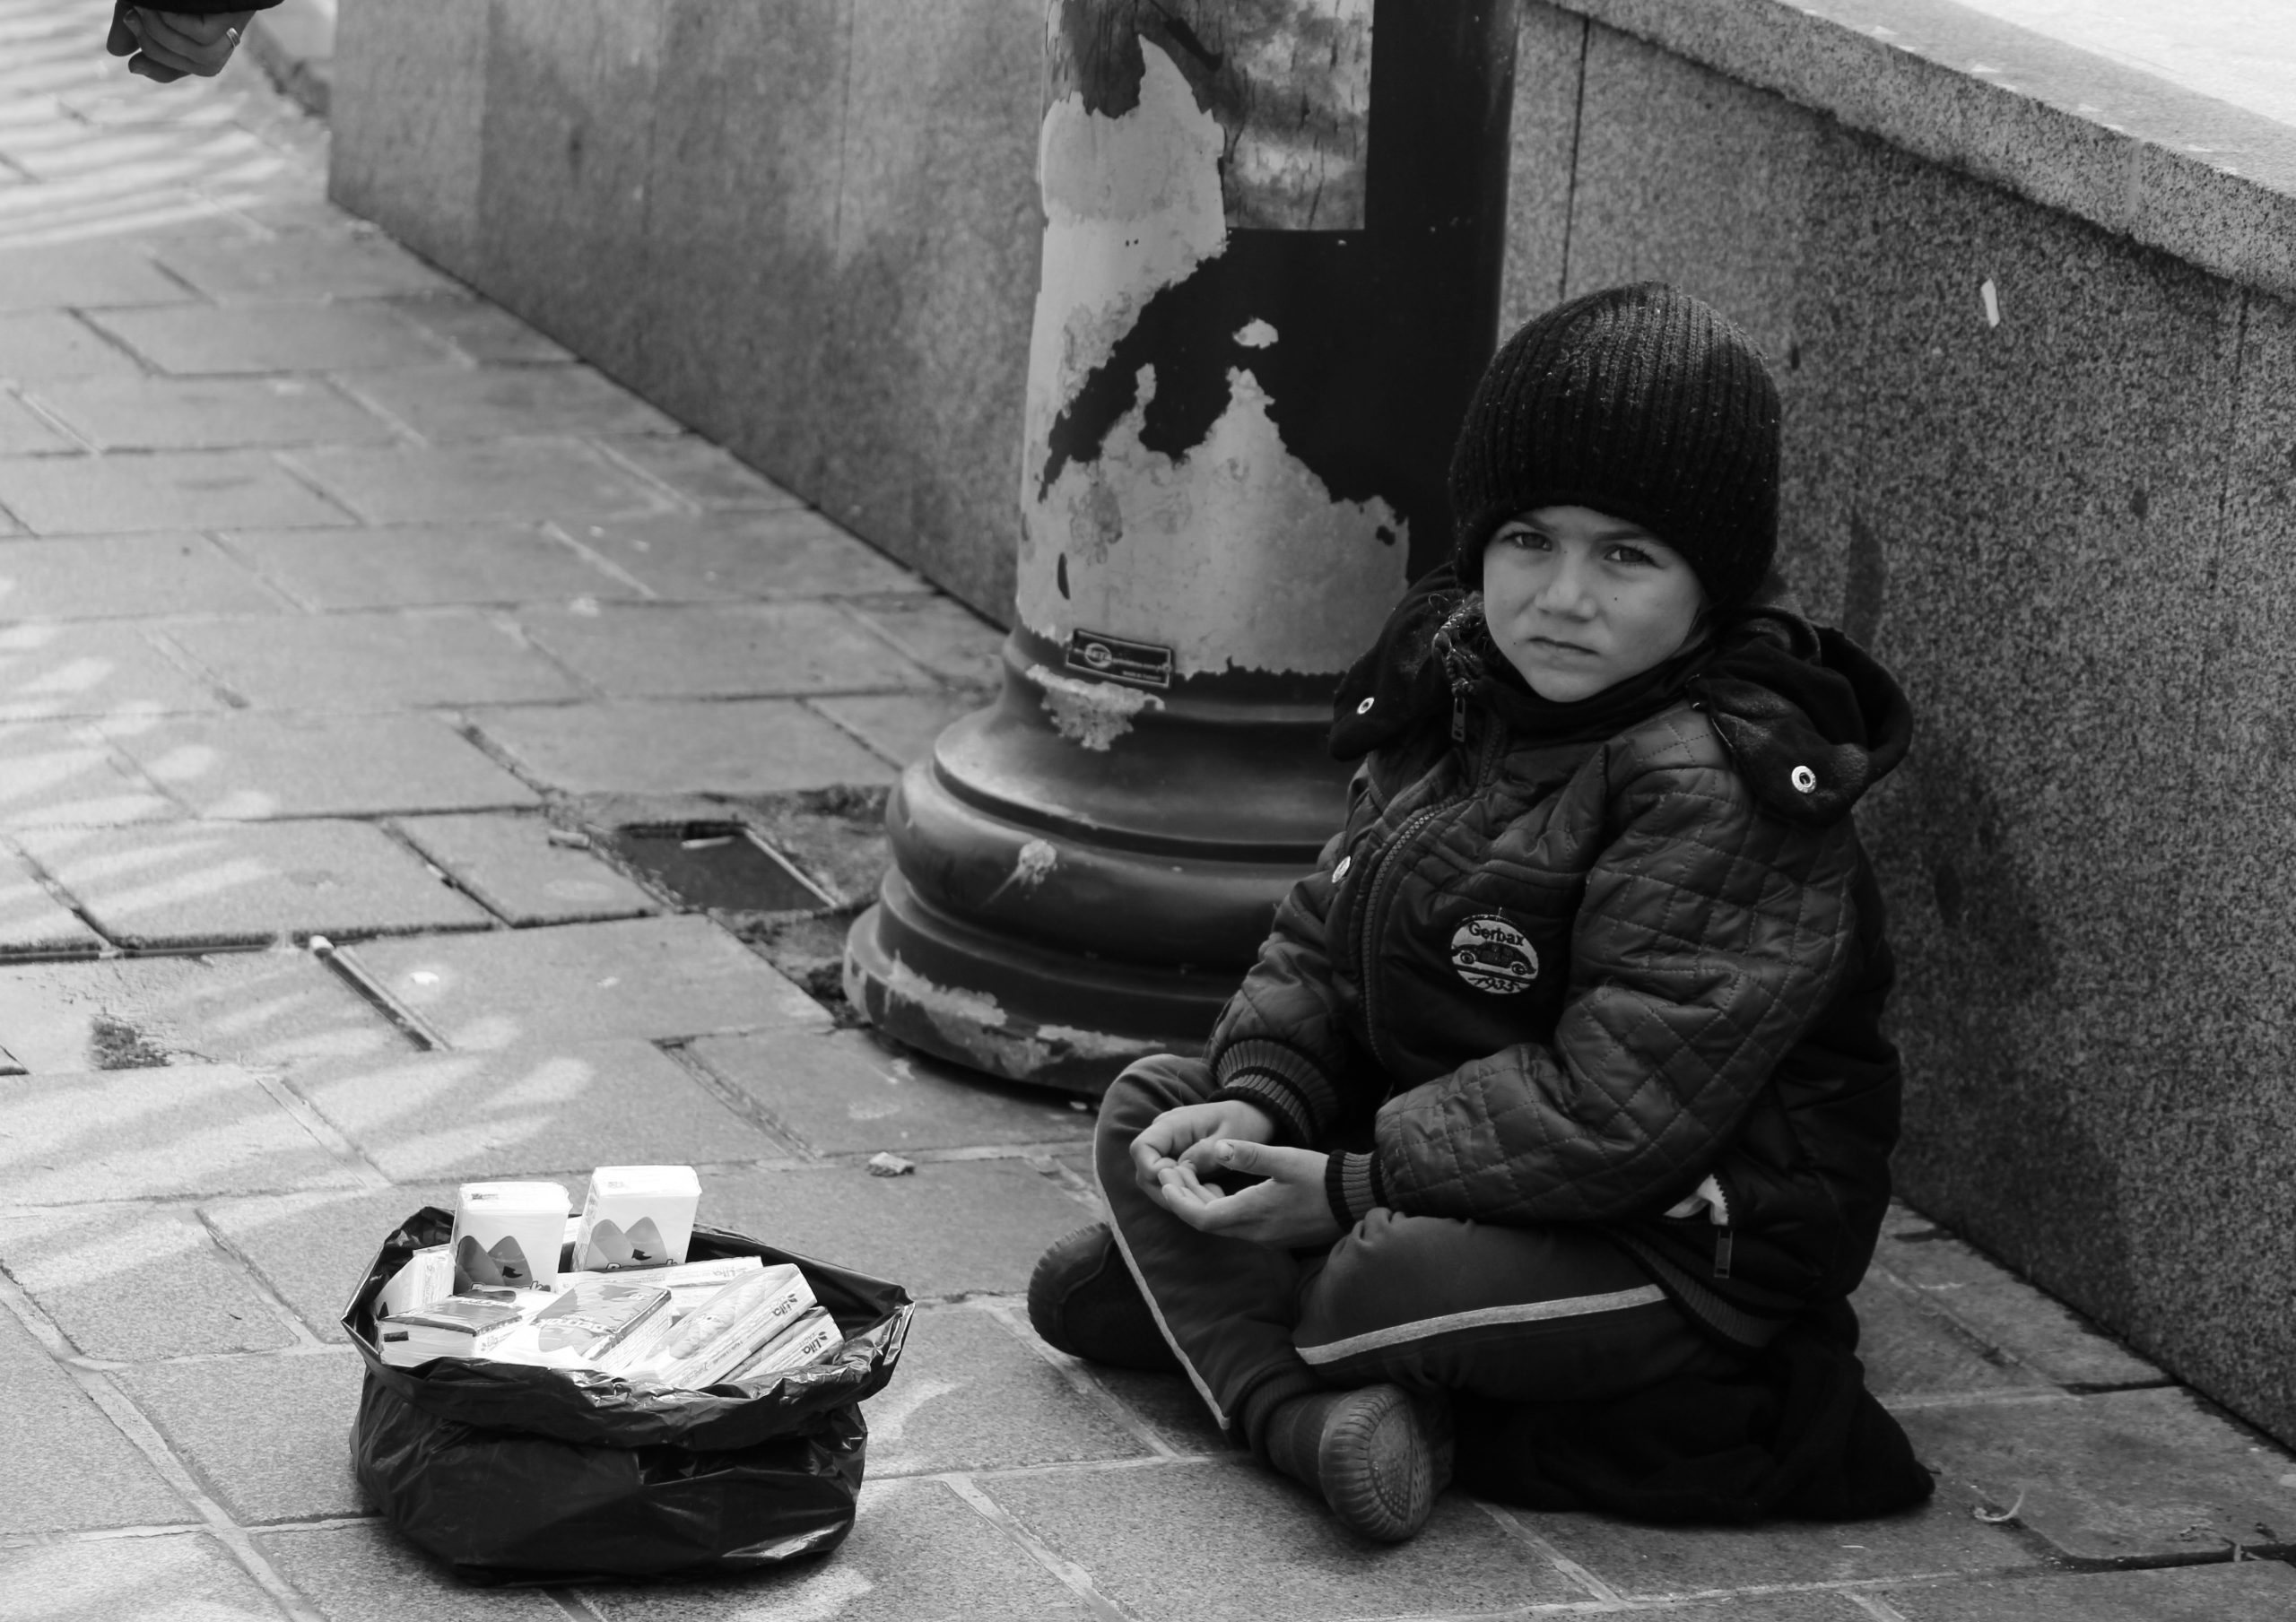 Child selling handkerchief on the street